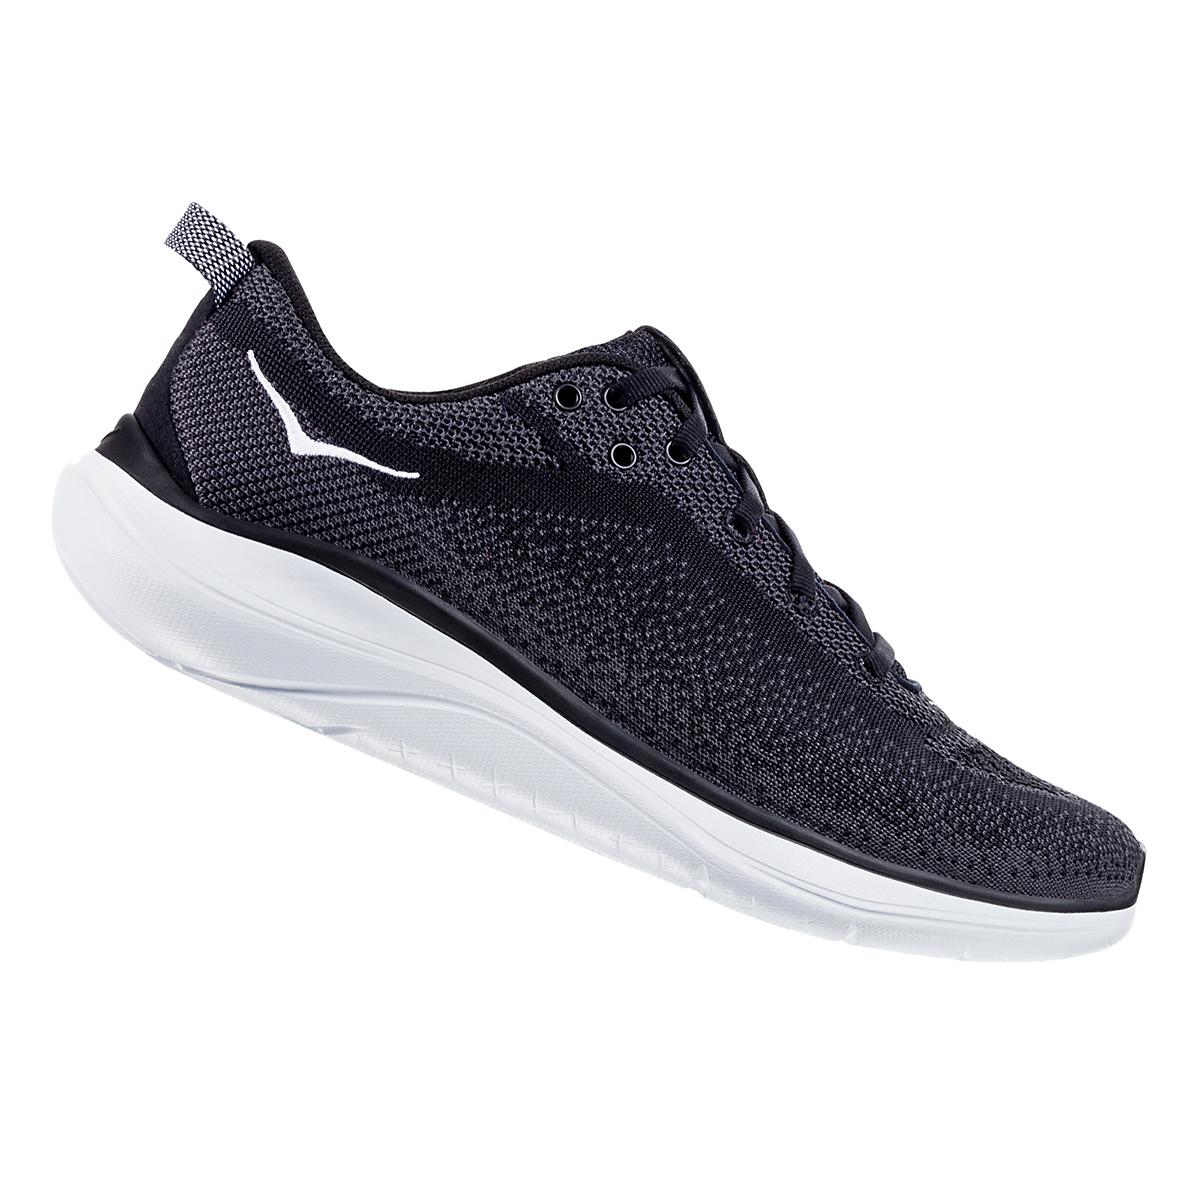 Women's Hoka One One Hupana Flow Running Shoe - Color: Black/ Dark Shadow - Size: 5 - Width: Wide, Black/ Dark Shadow, large, image 1